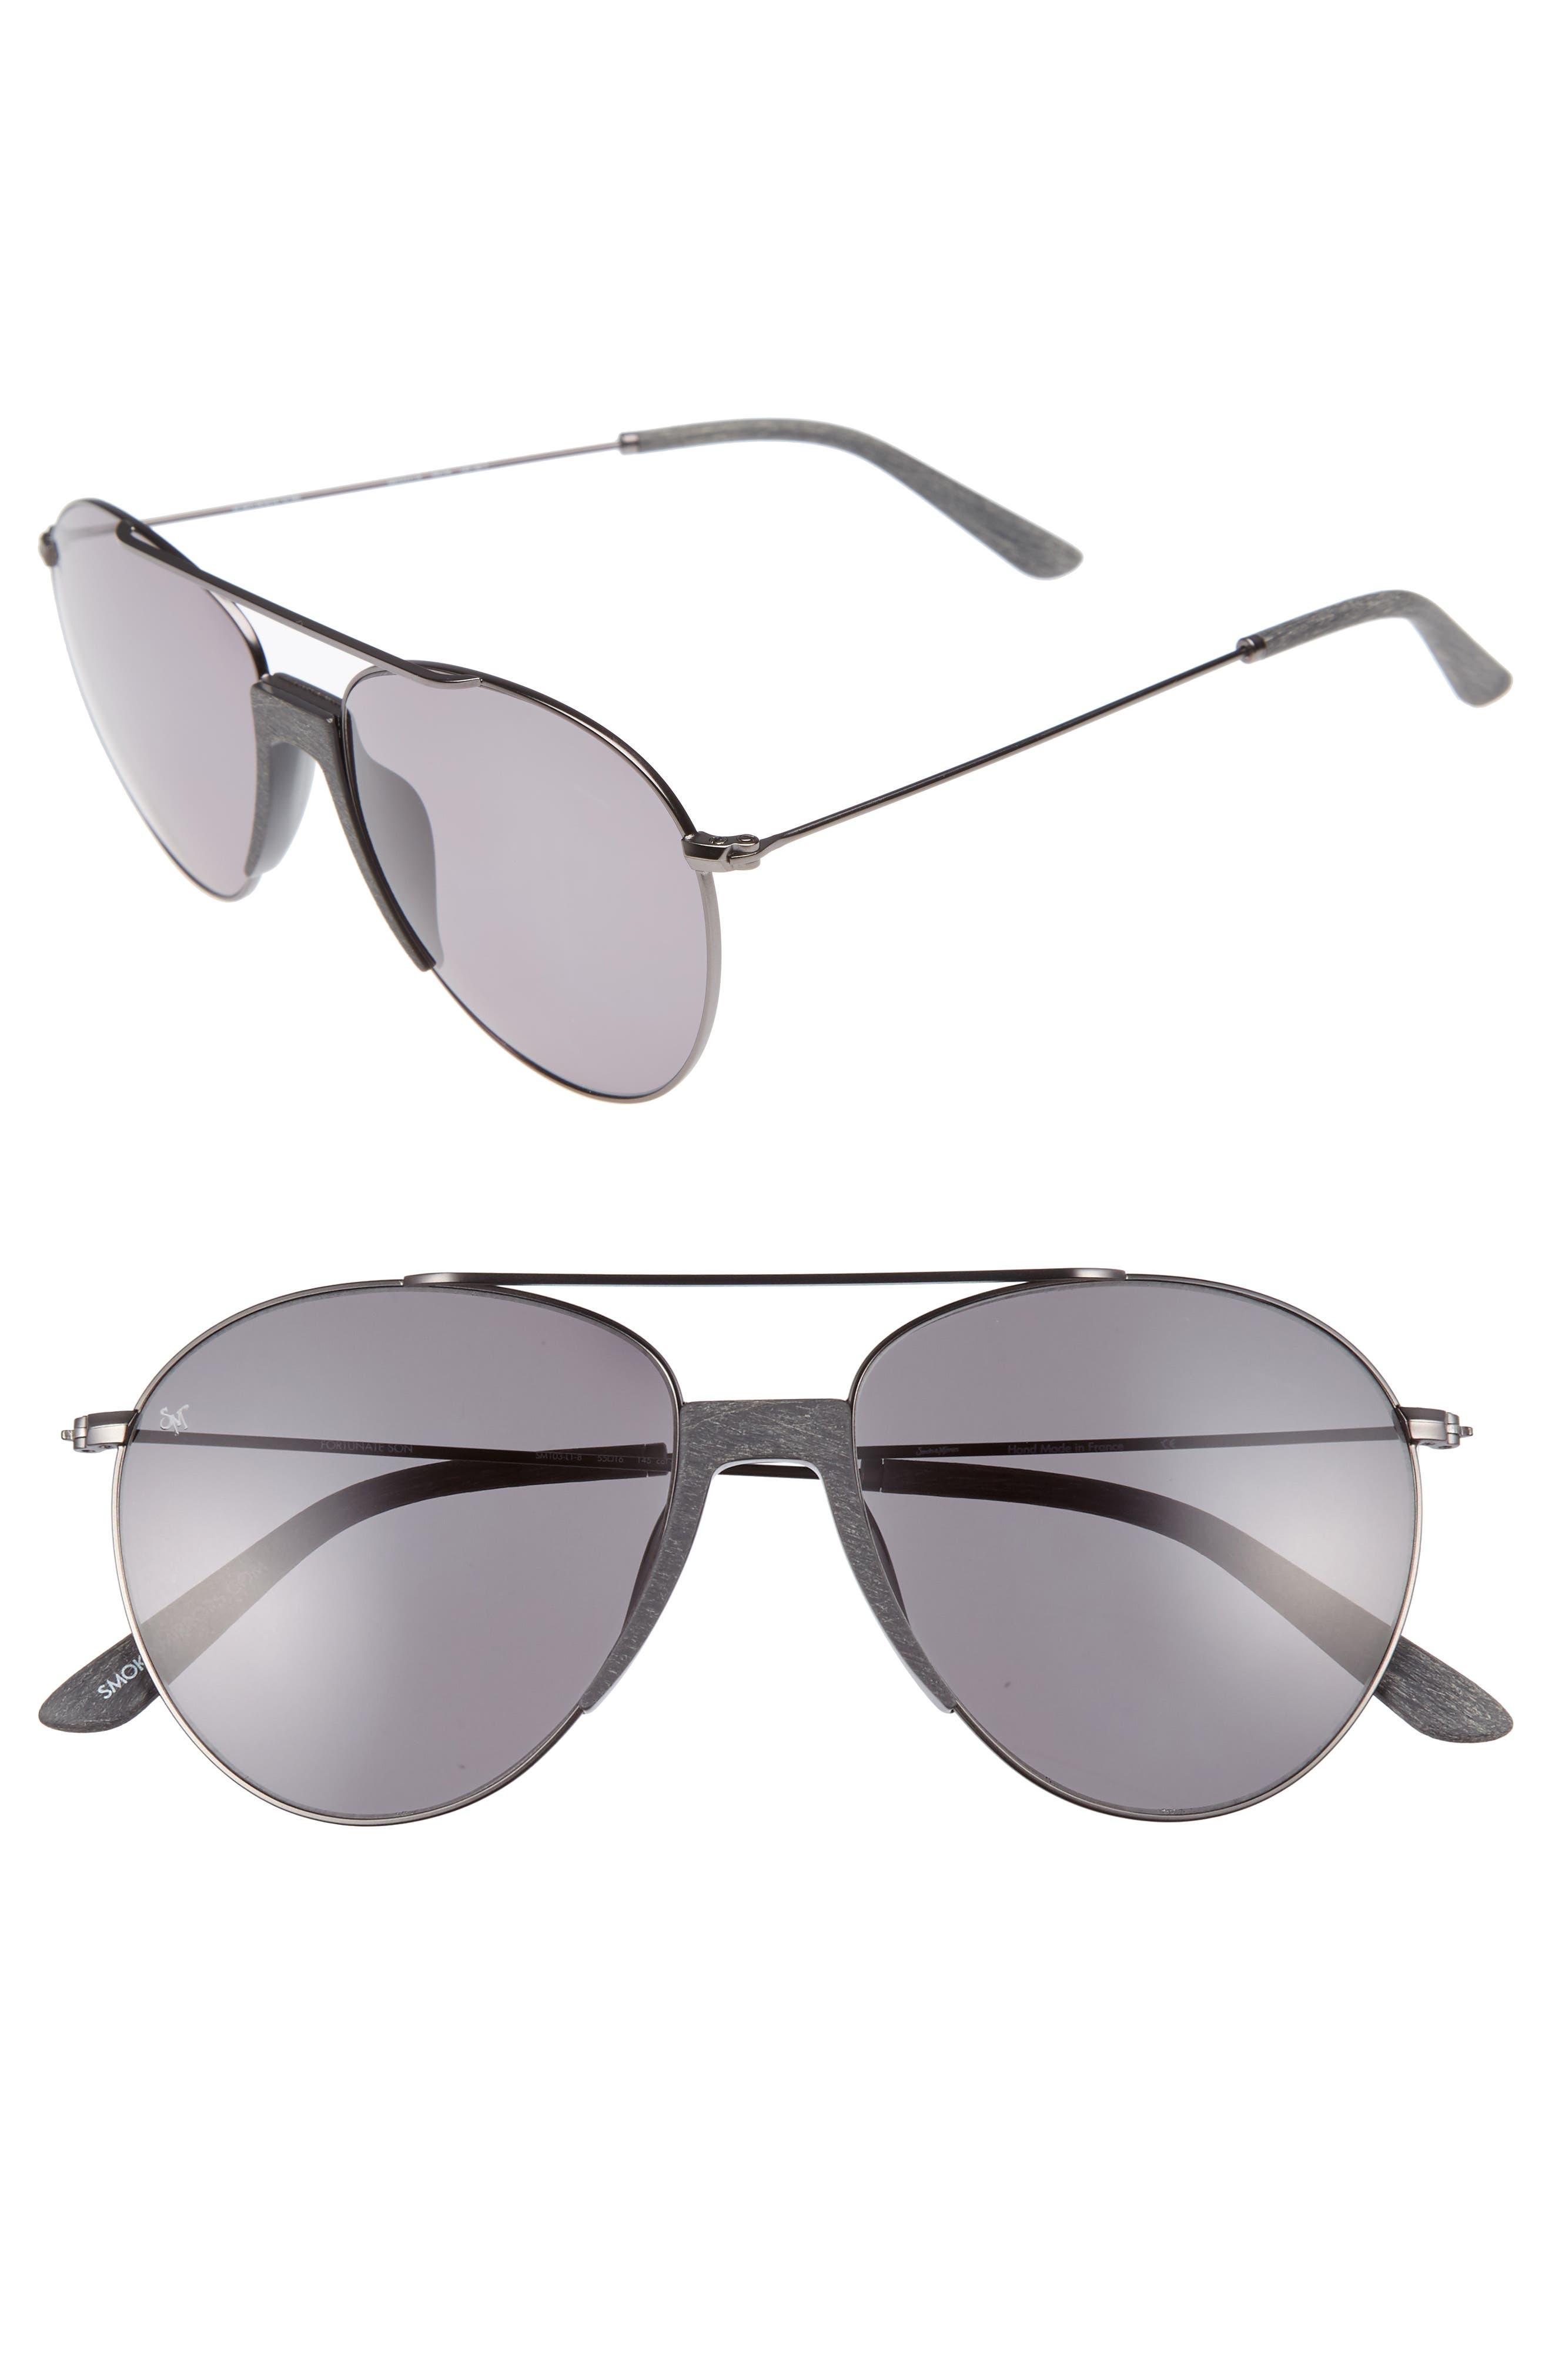 Fortunate Son 55mm Gradient Lens Aviator Sunglasses,                         Main,                         color, 020